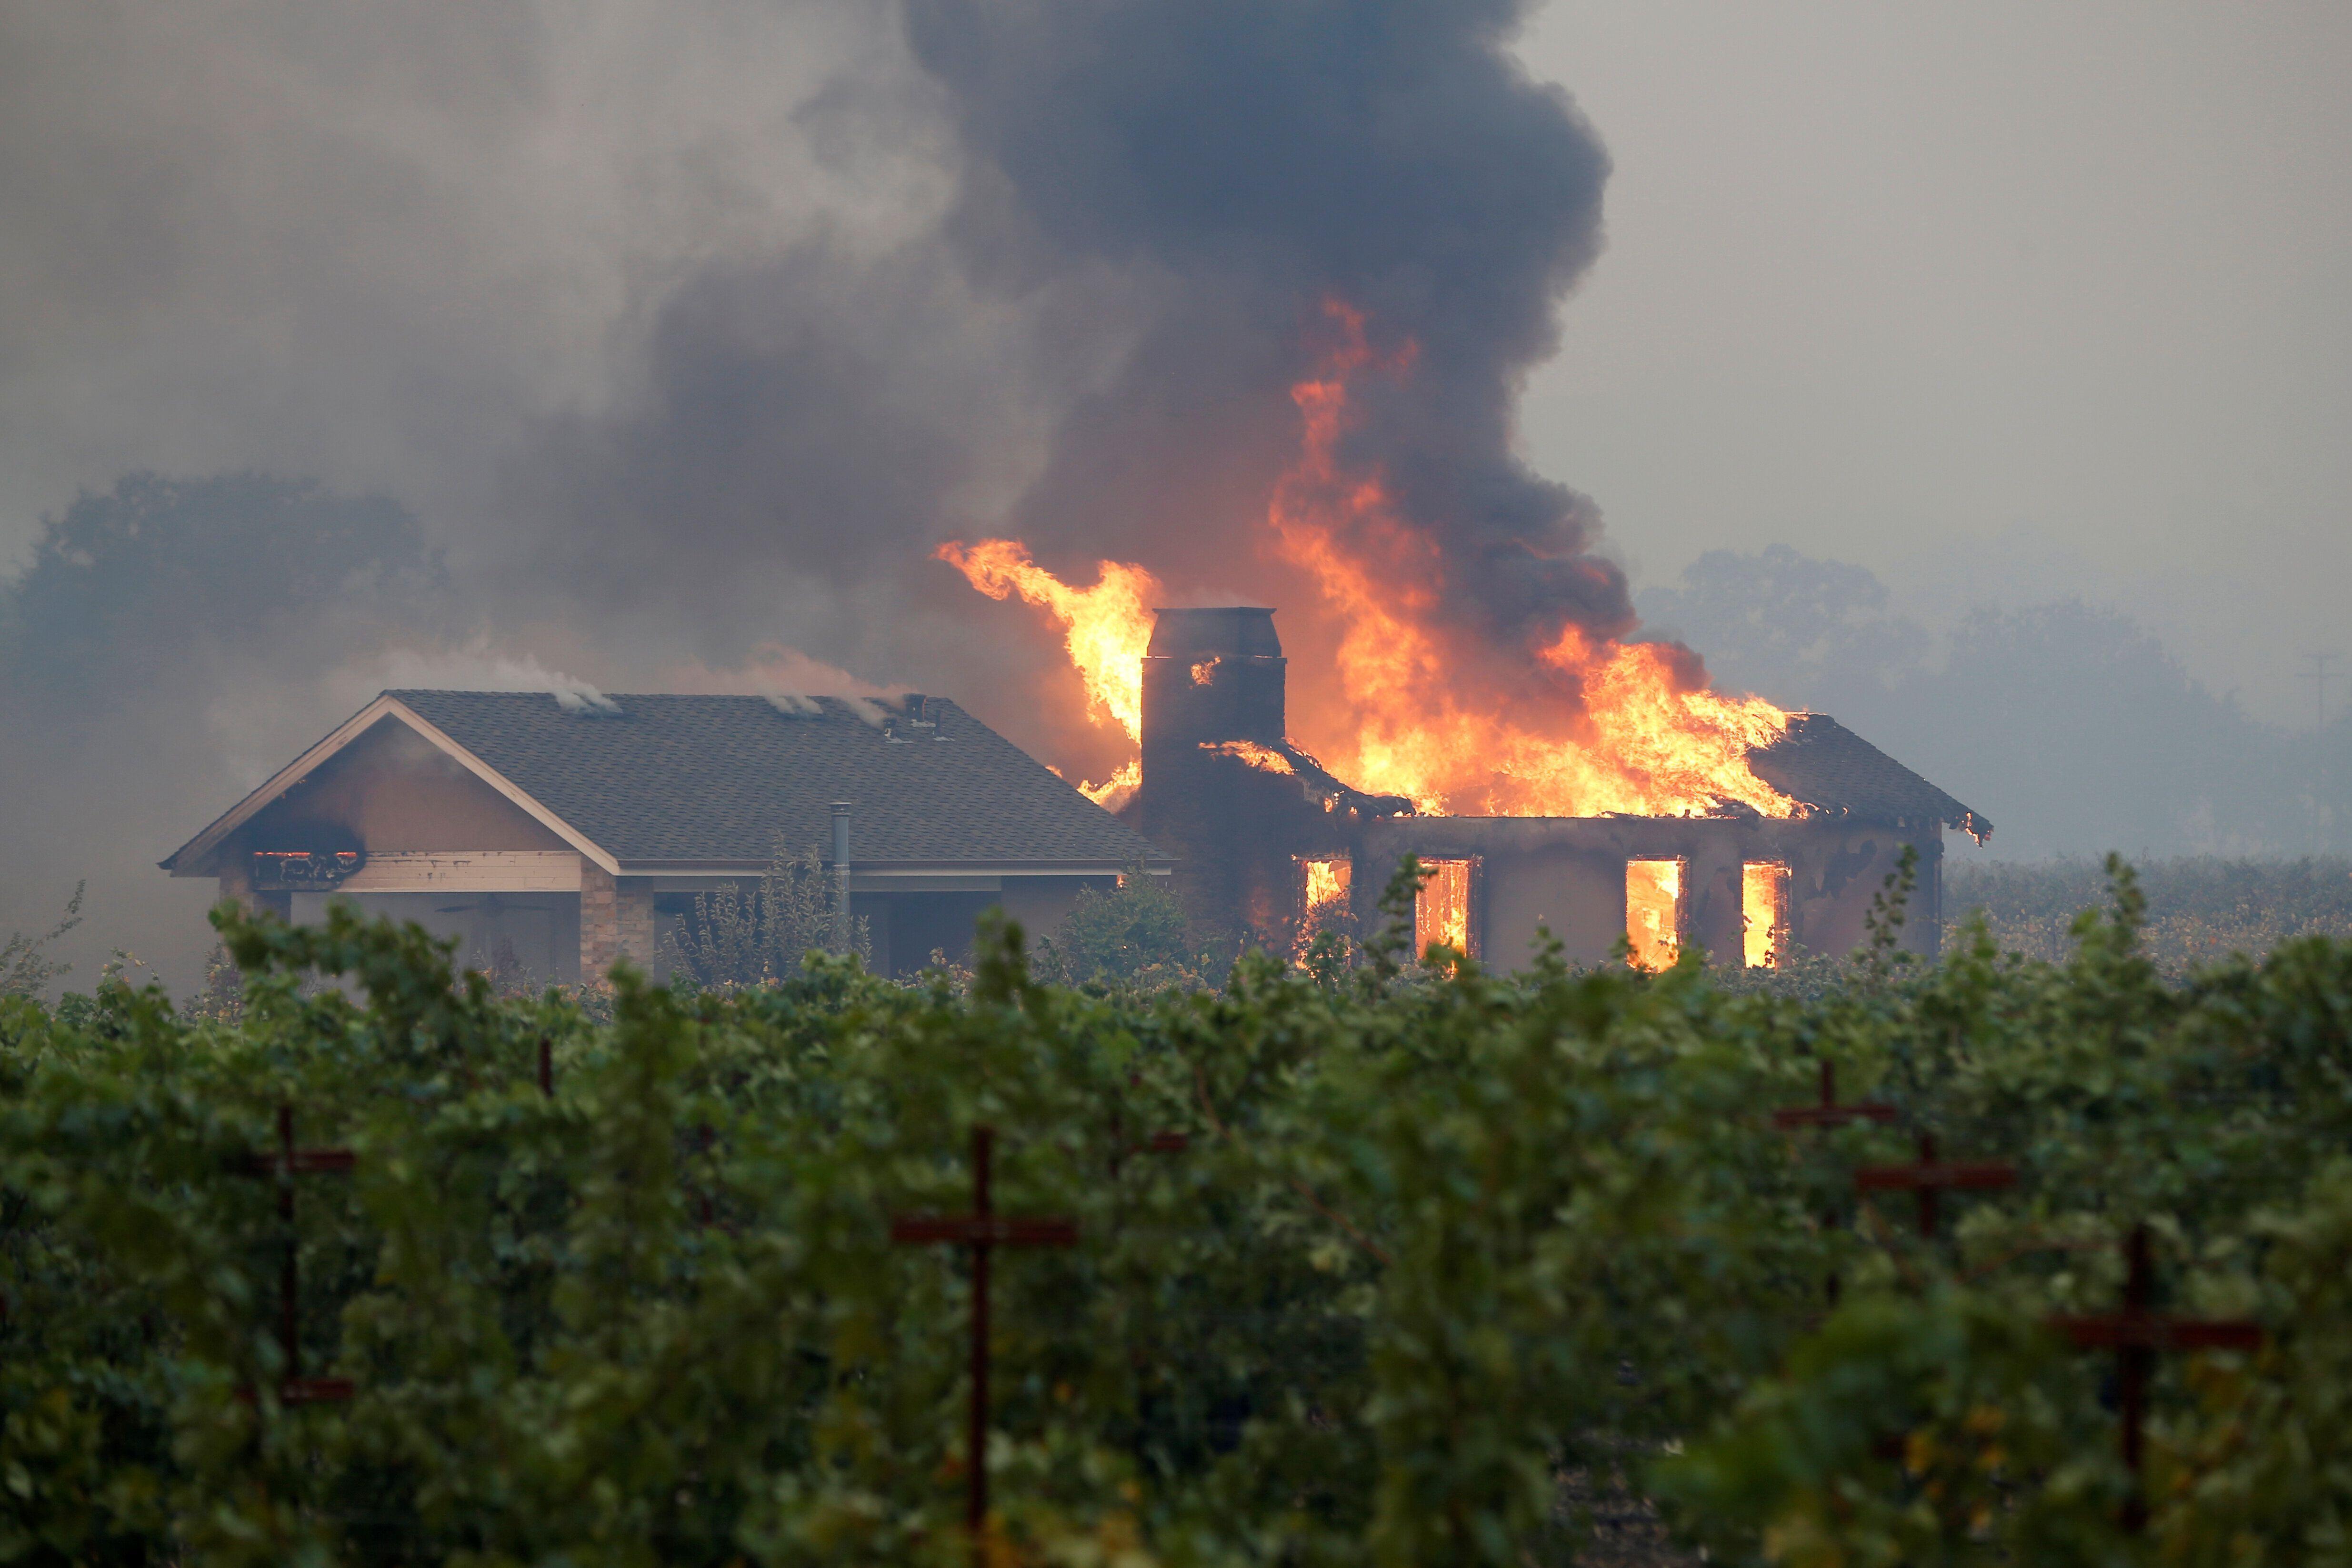 A building burns Thursday during the Kincade fire in Geyserville, California.